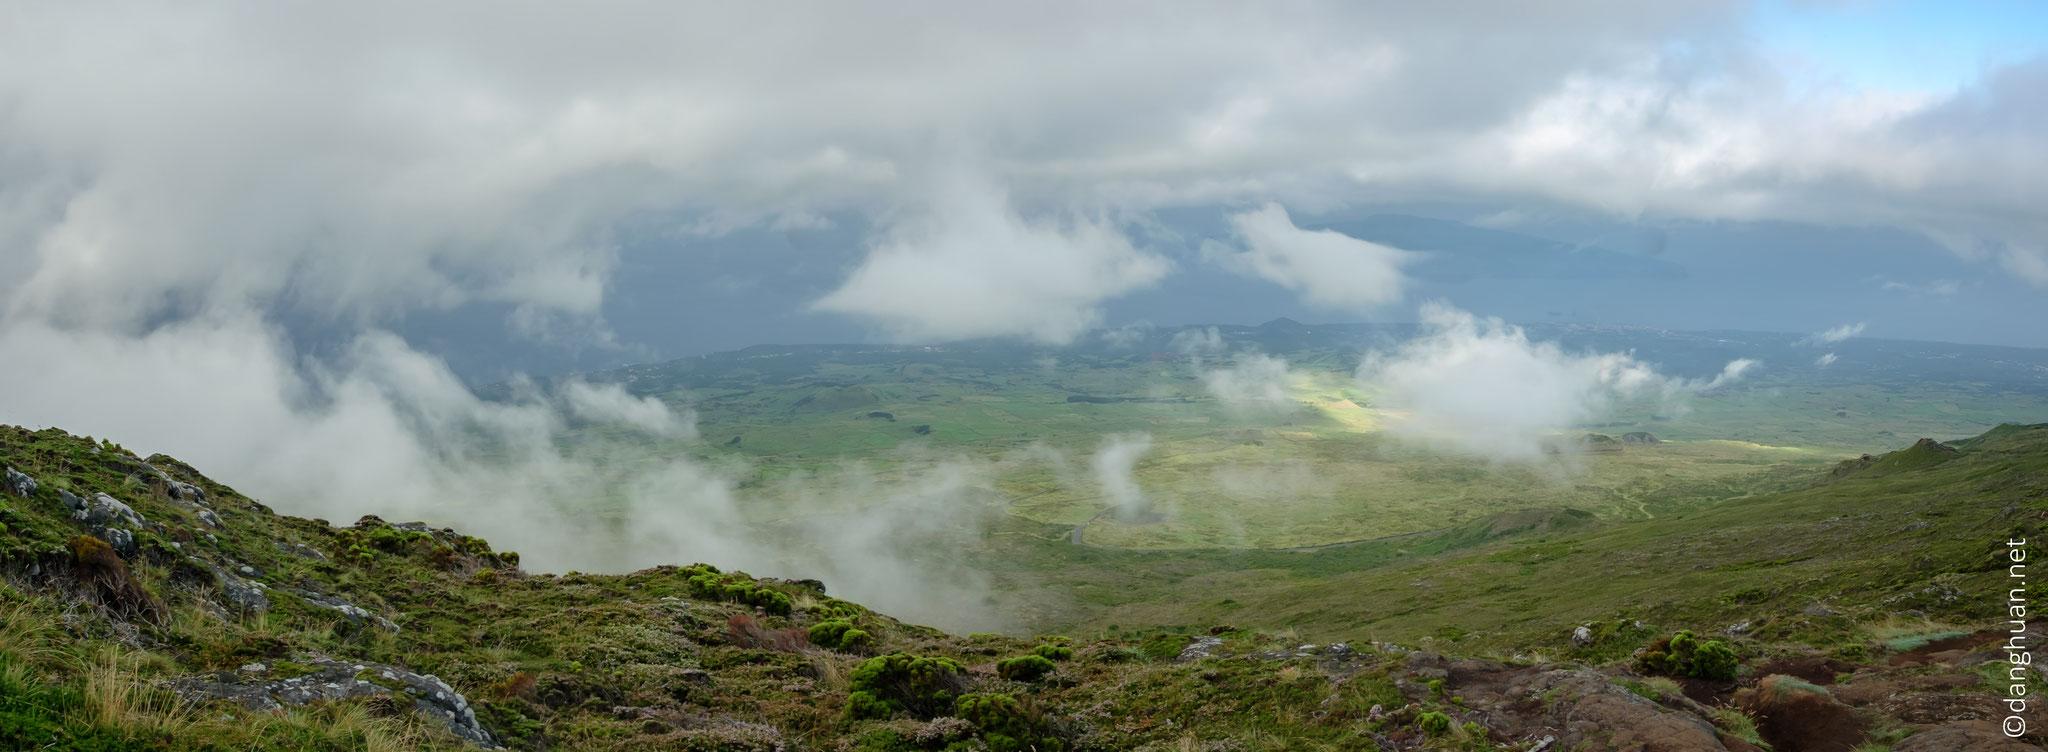 panorama depuis mi hauteur du Pico